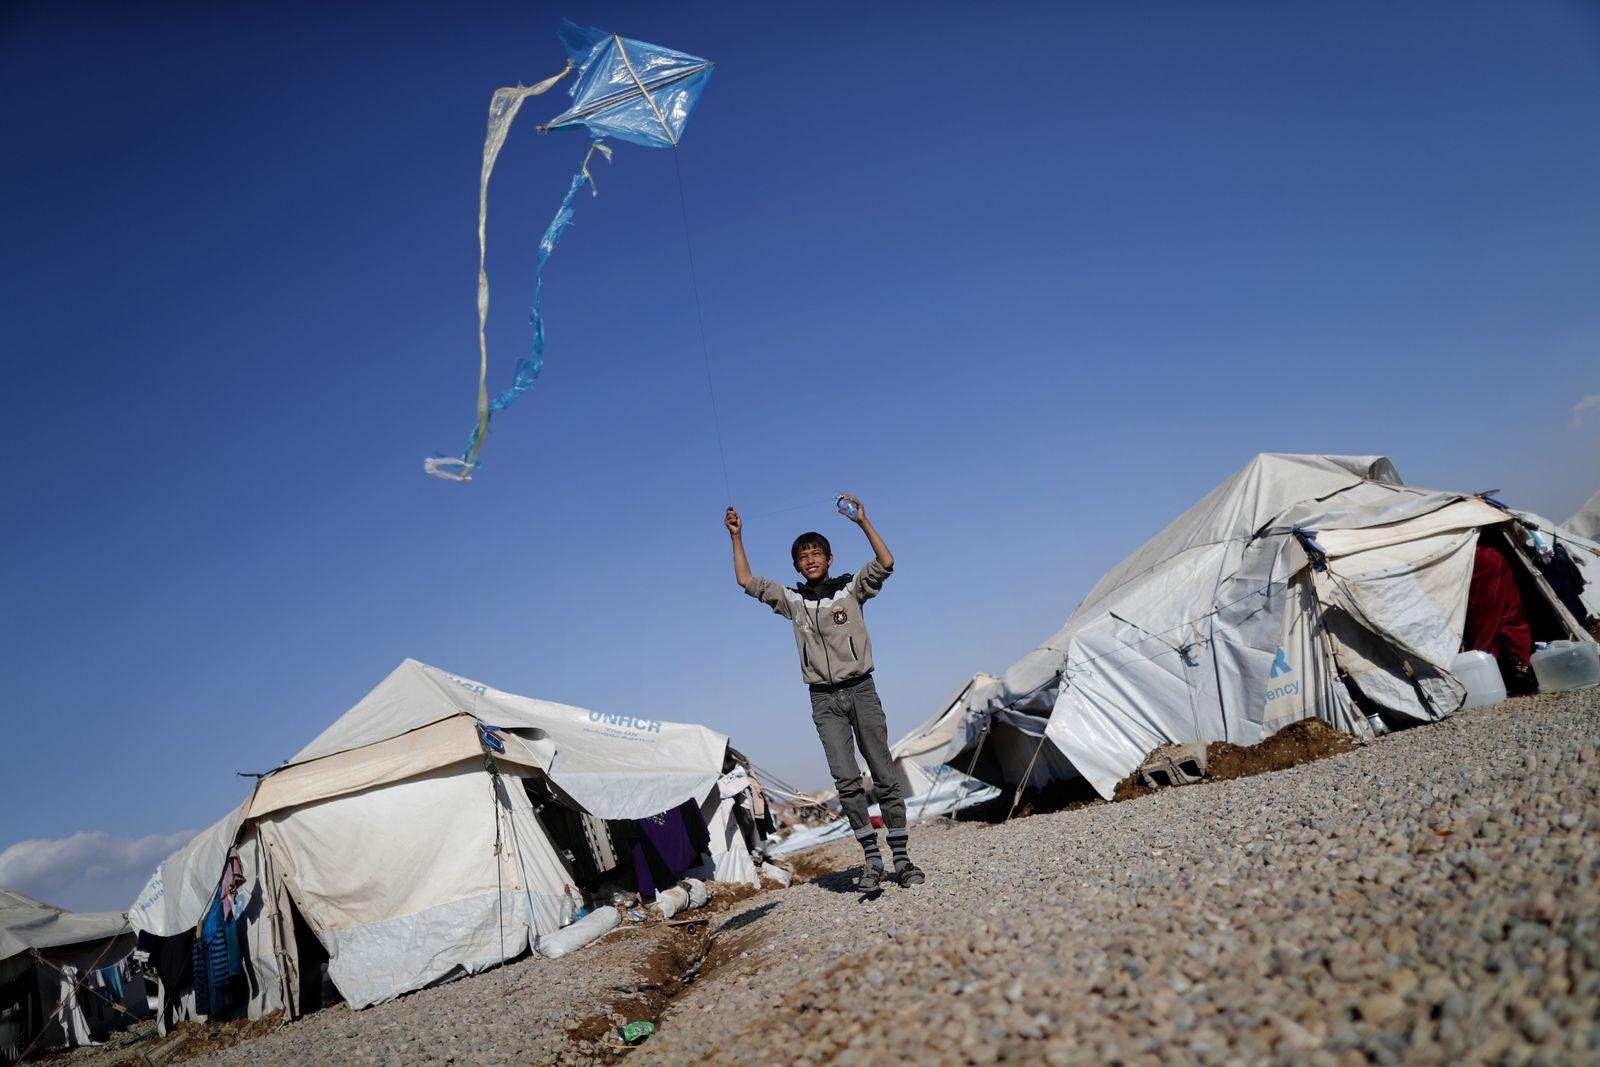 IRAQ-CONFLICT-MOSUL-DISPLACED